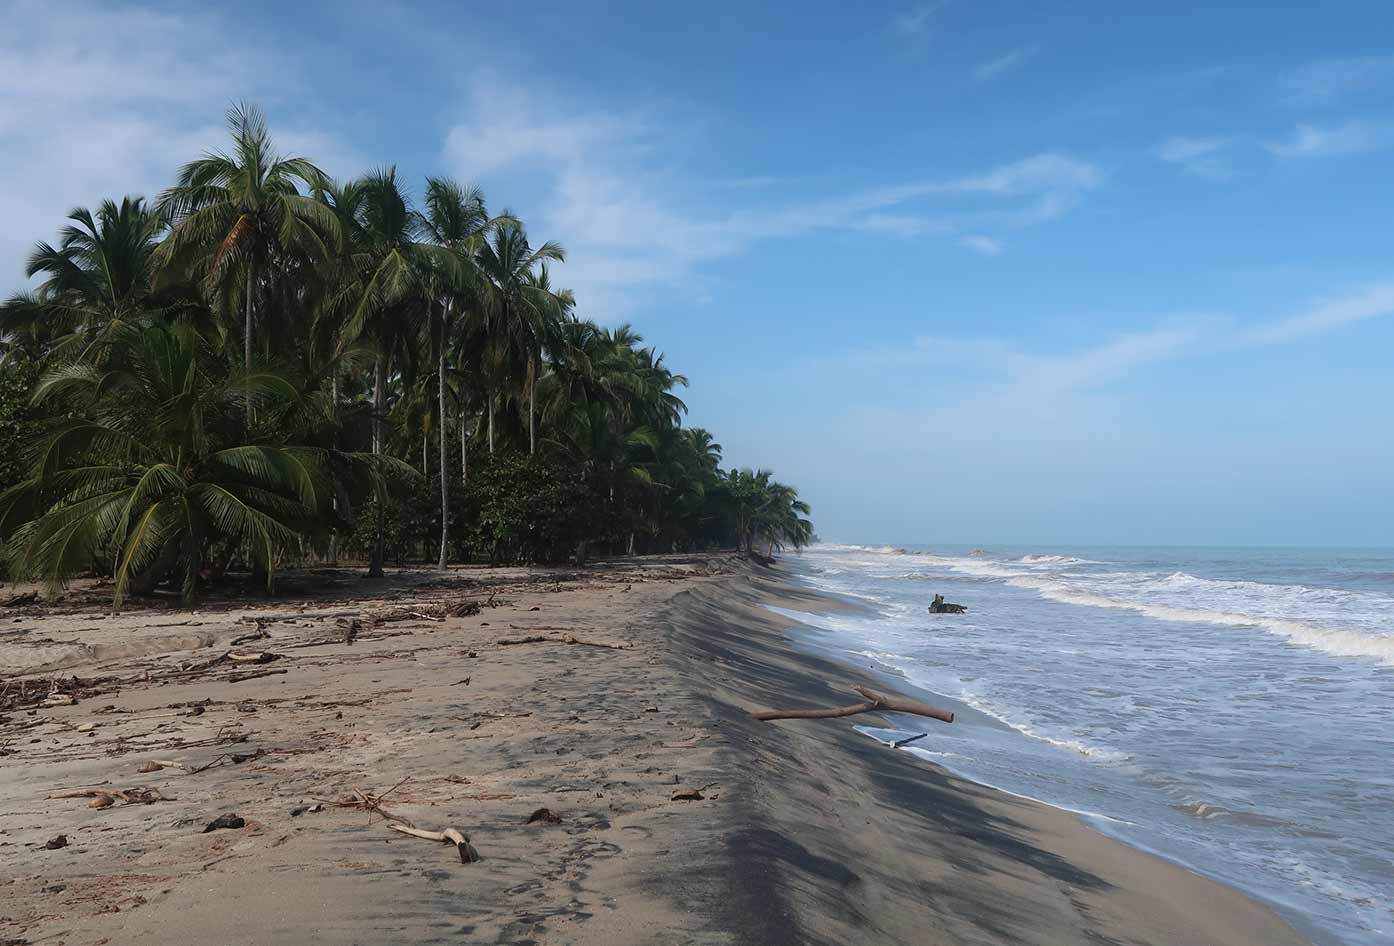 palomino beach colombia